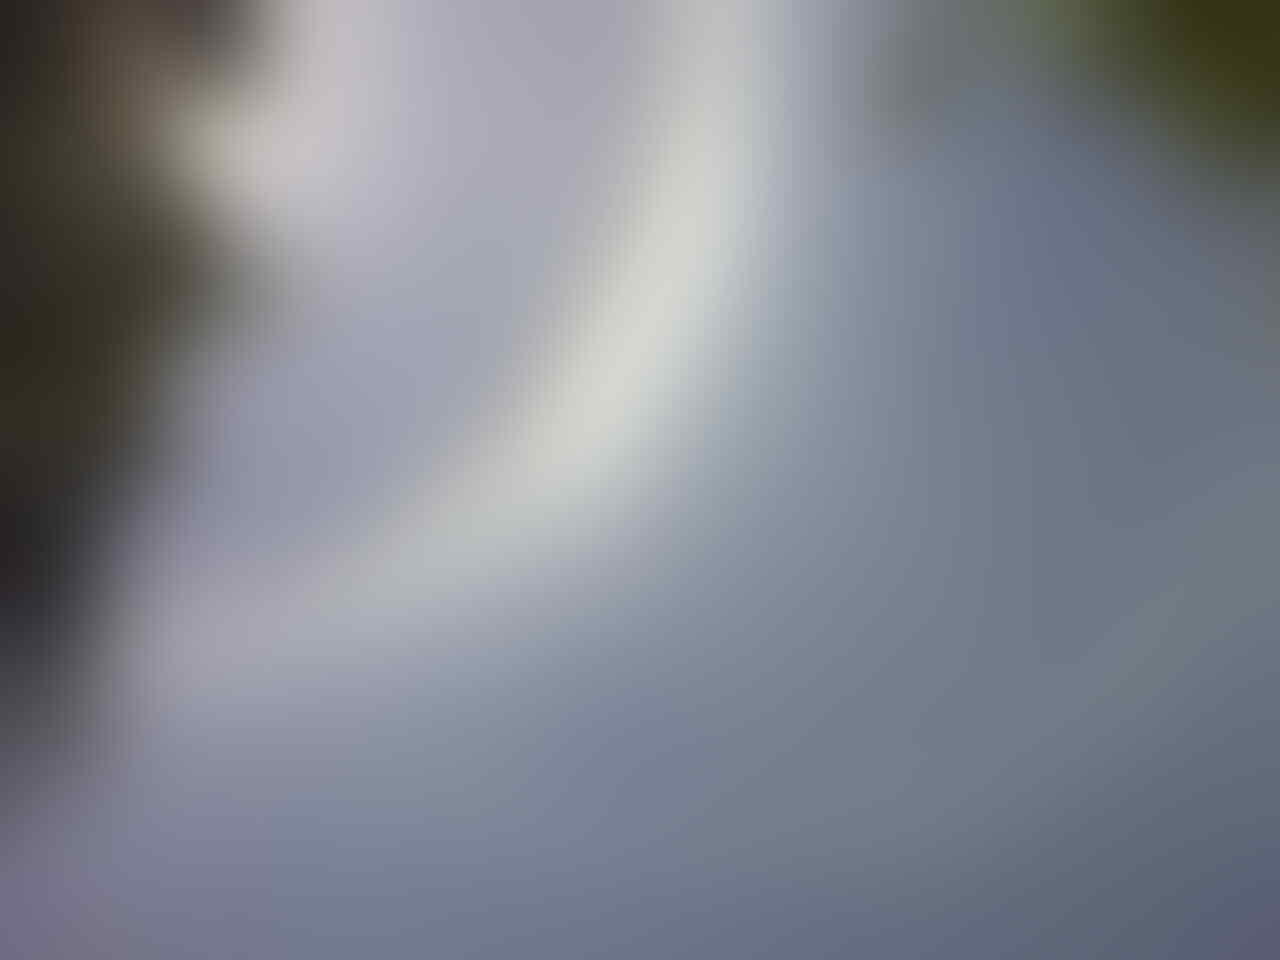 Fenomena Pelangi Mengelilingi Matahari di Surabaya (21-8-2013)